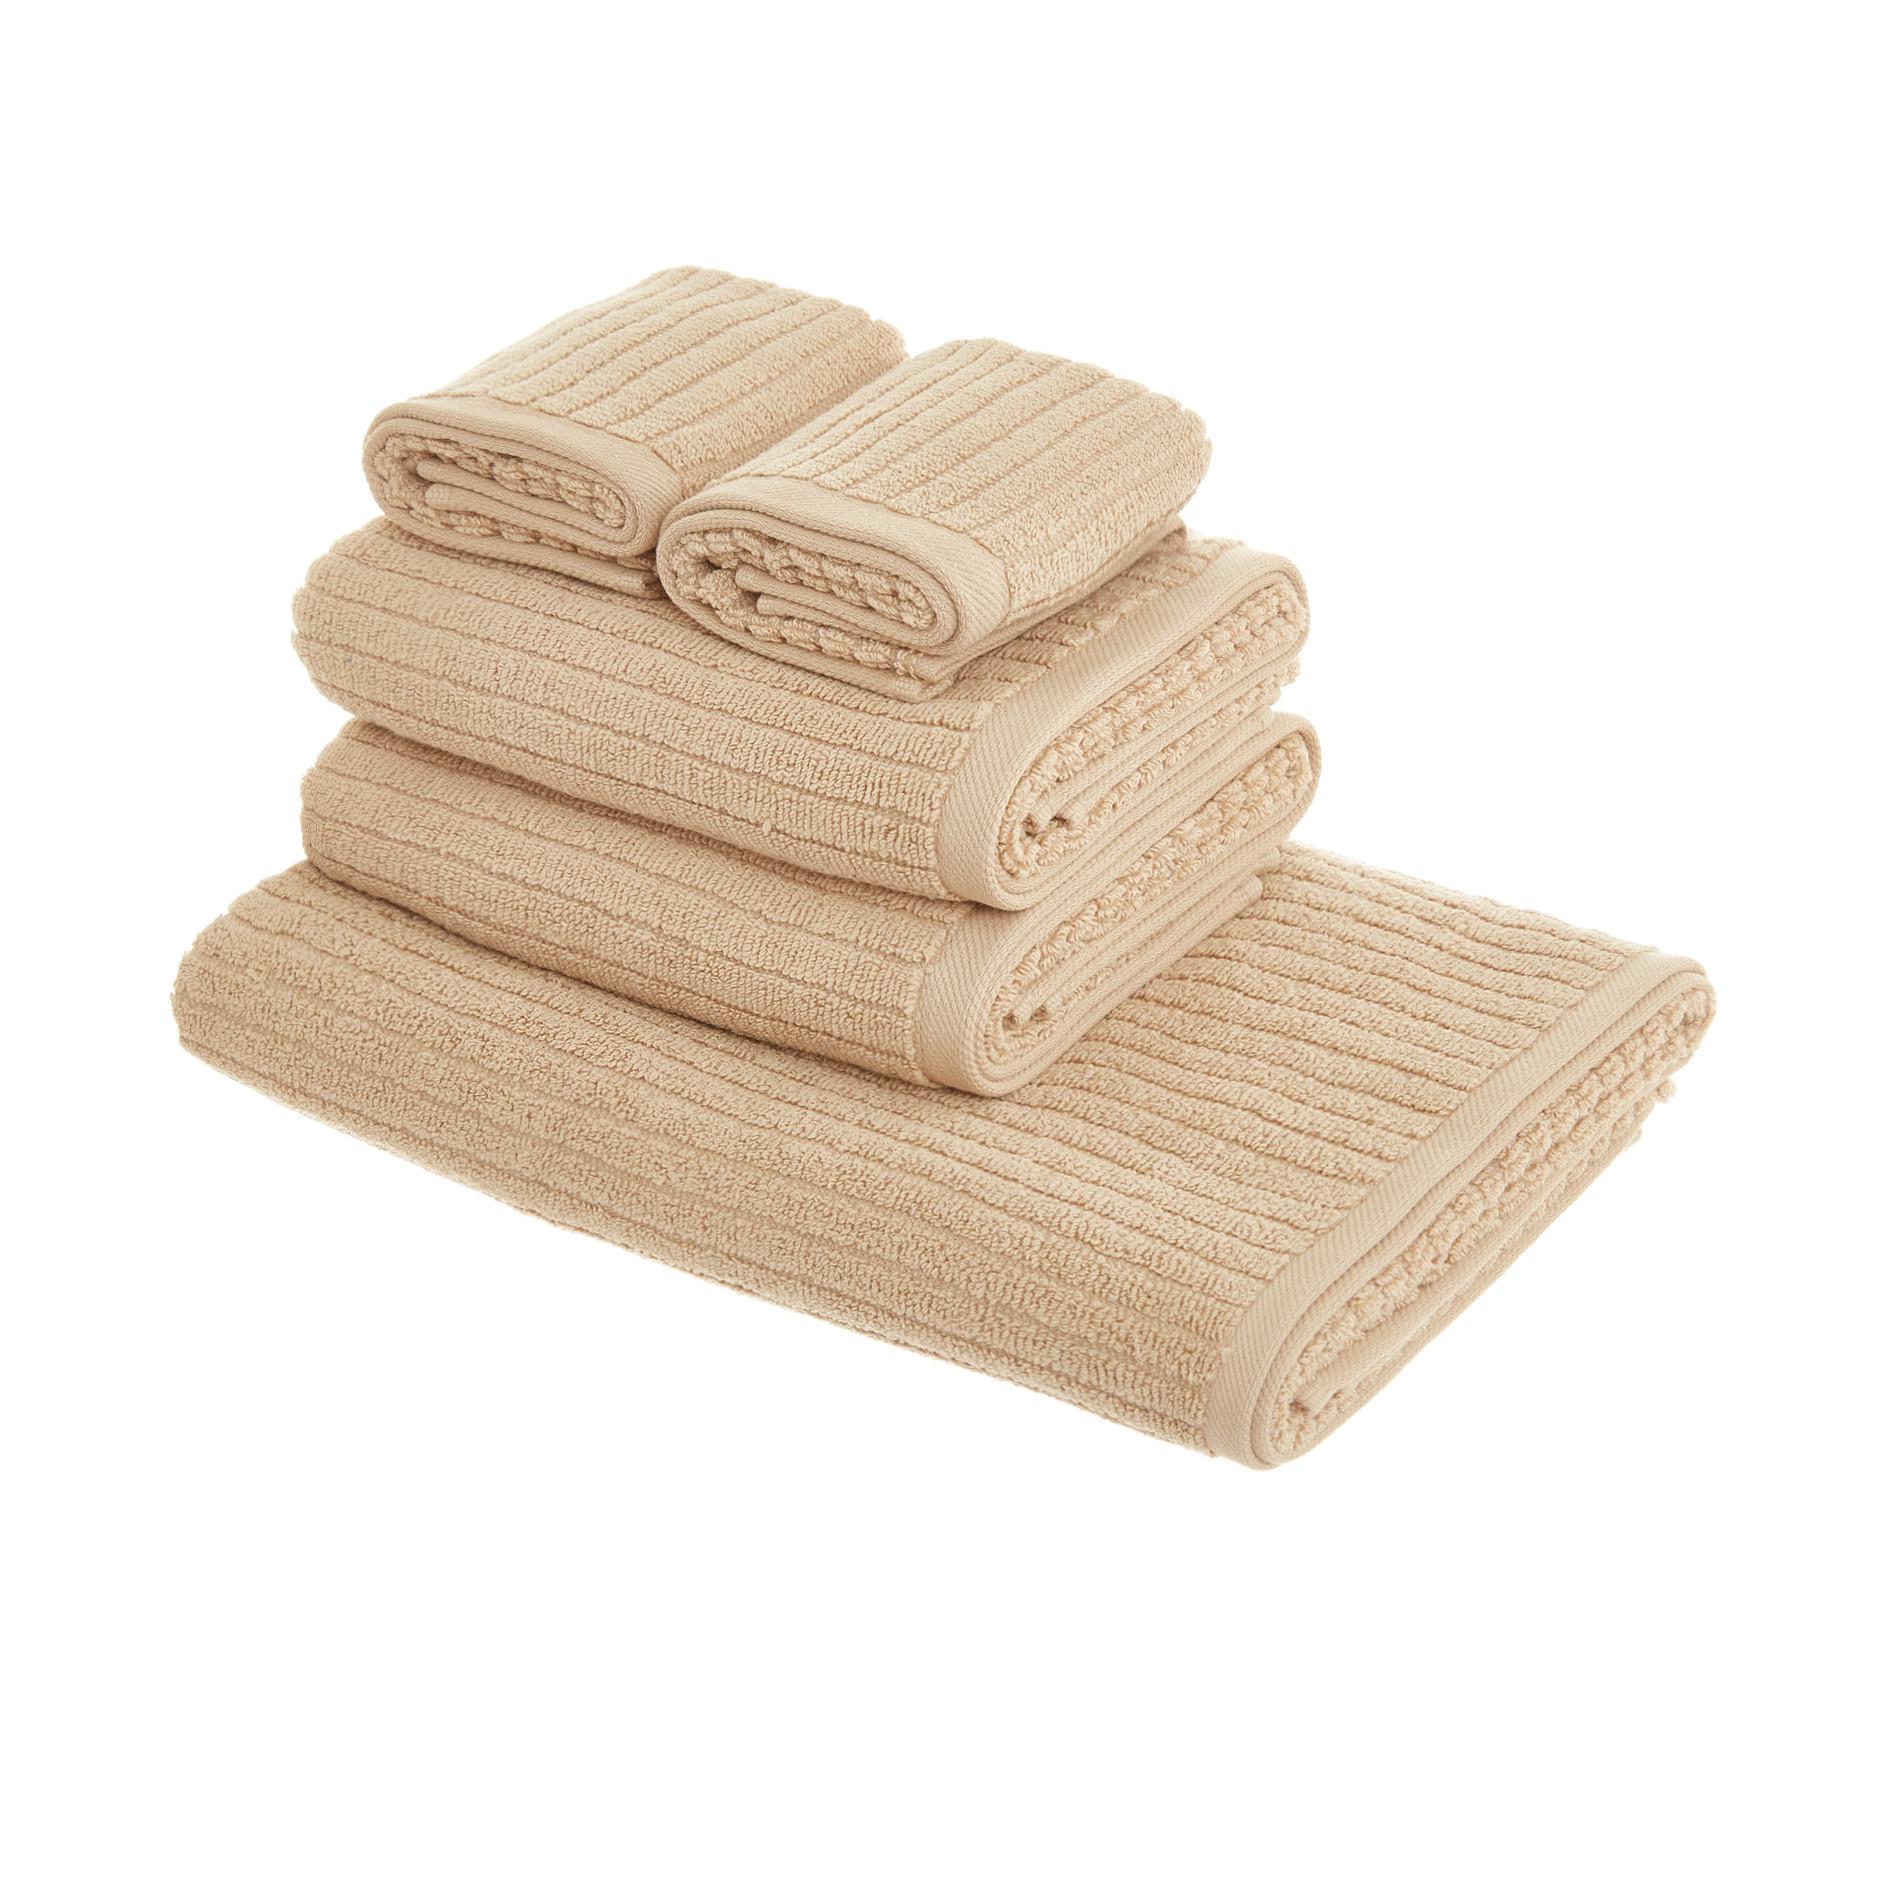 Set asciugamani puro cotone righe jacquard tinta unita, Beige, large image number 1